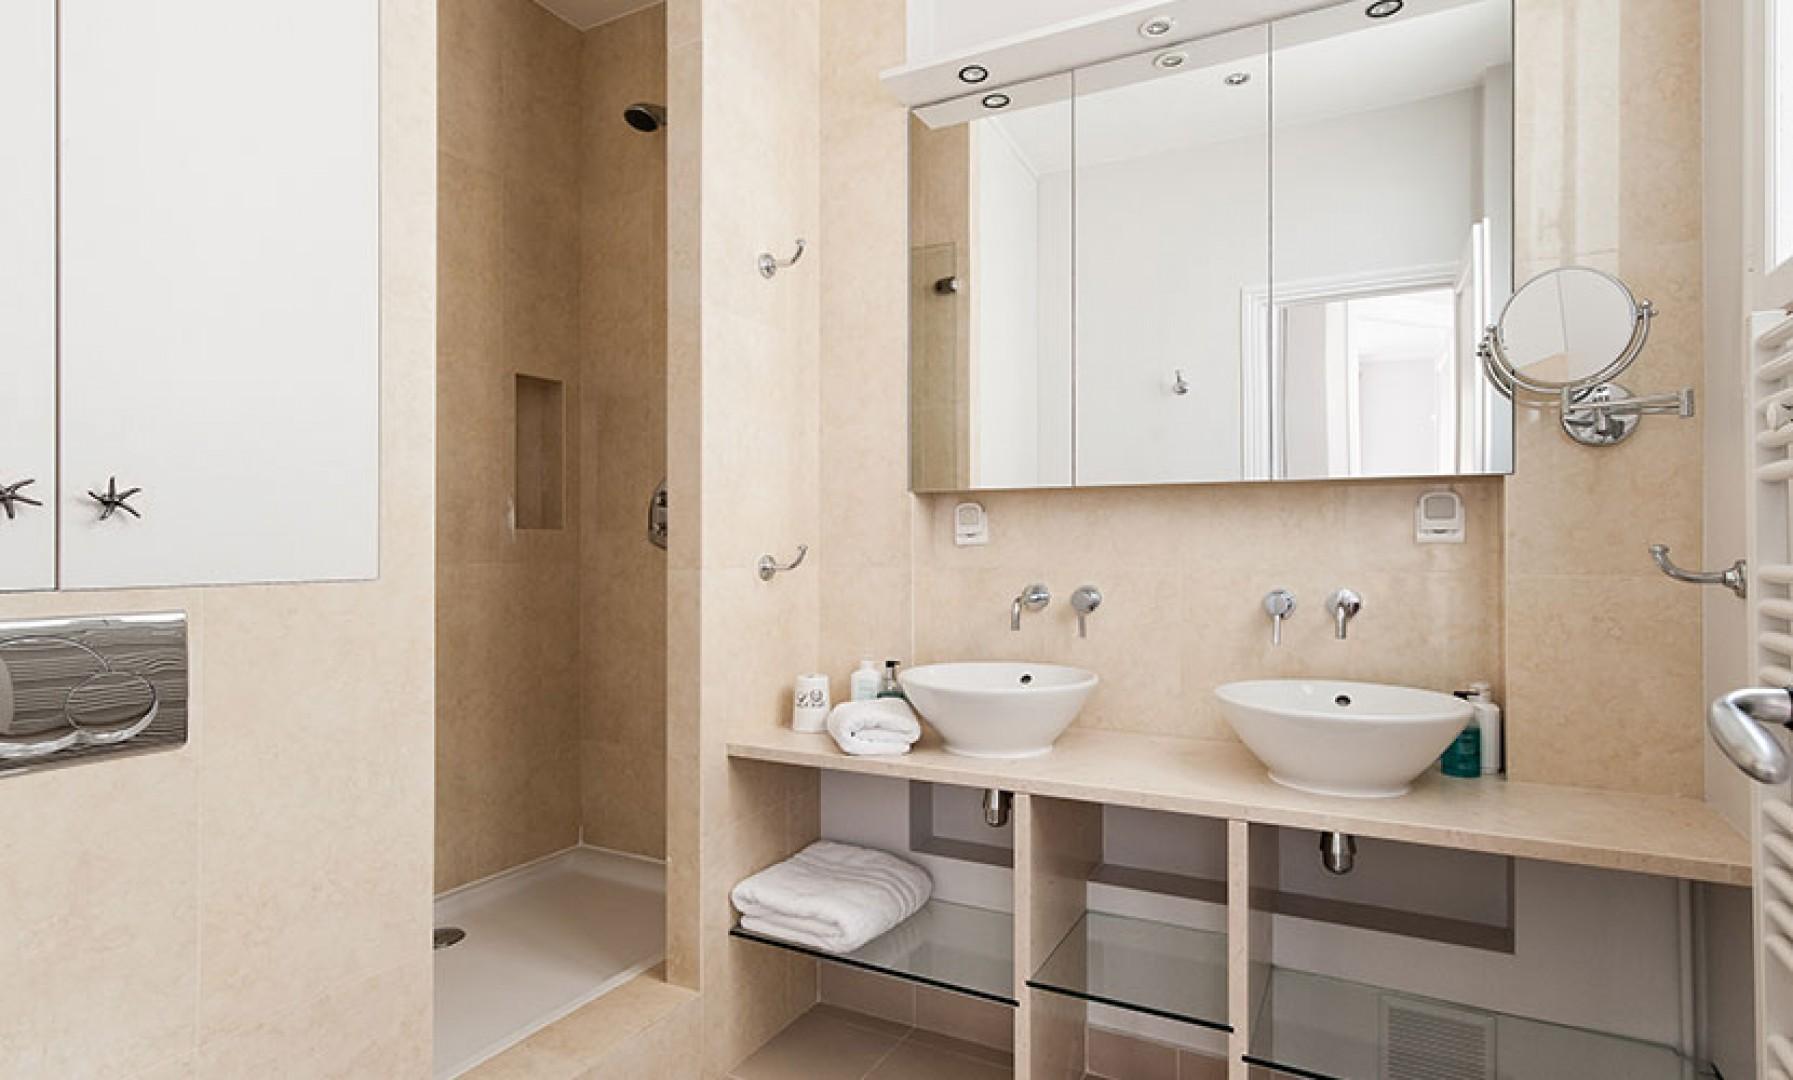 Bathroom 2 with shower, double sinks, toilet and heated towel racks